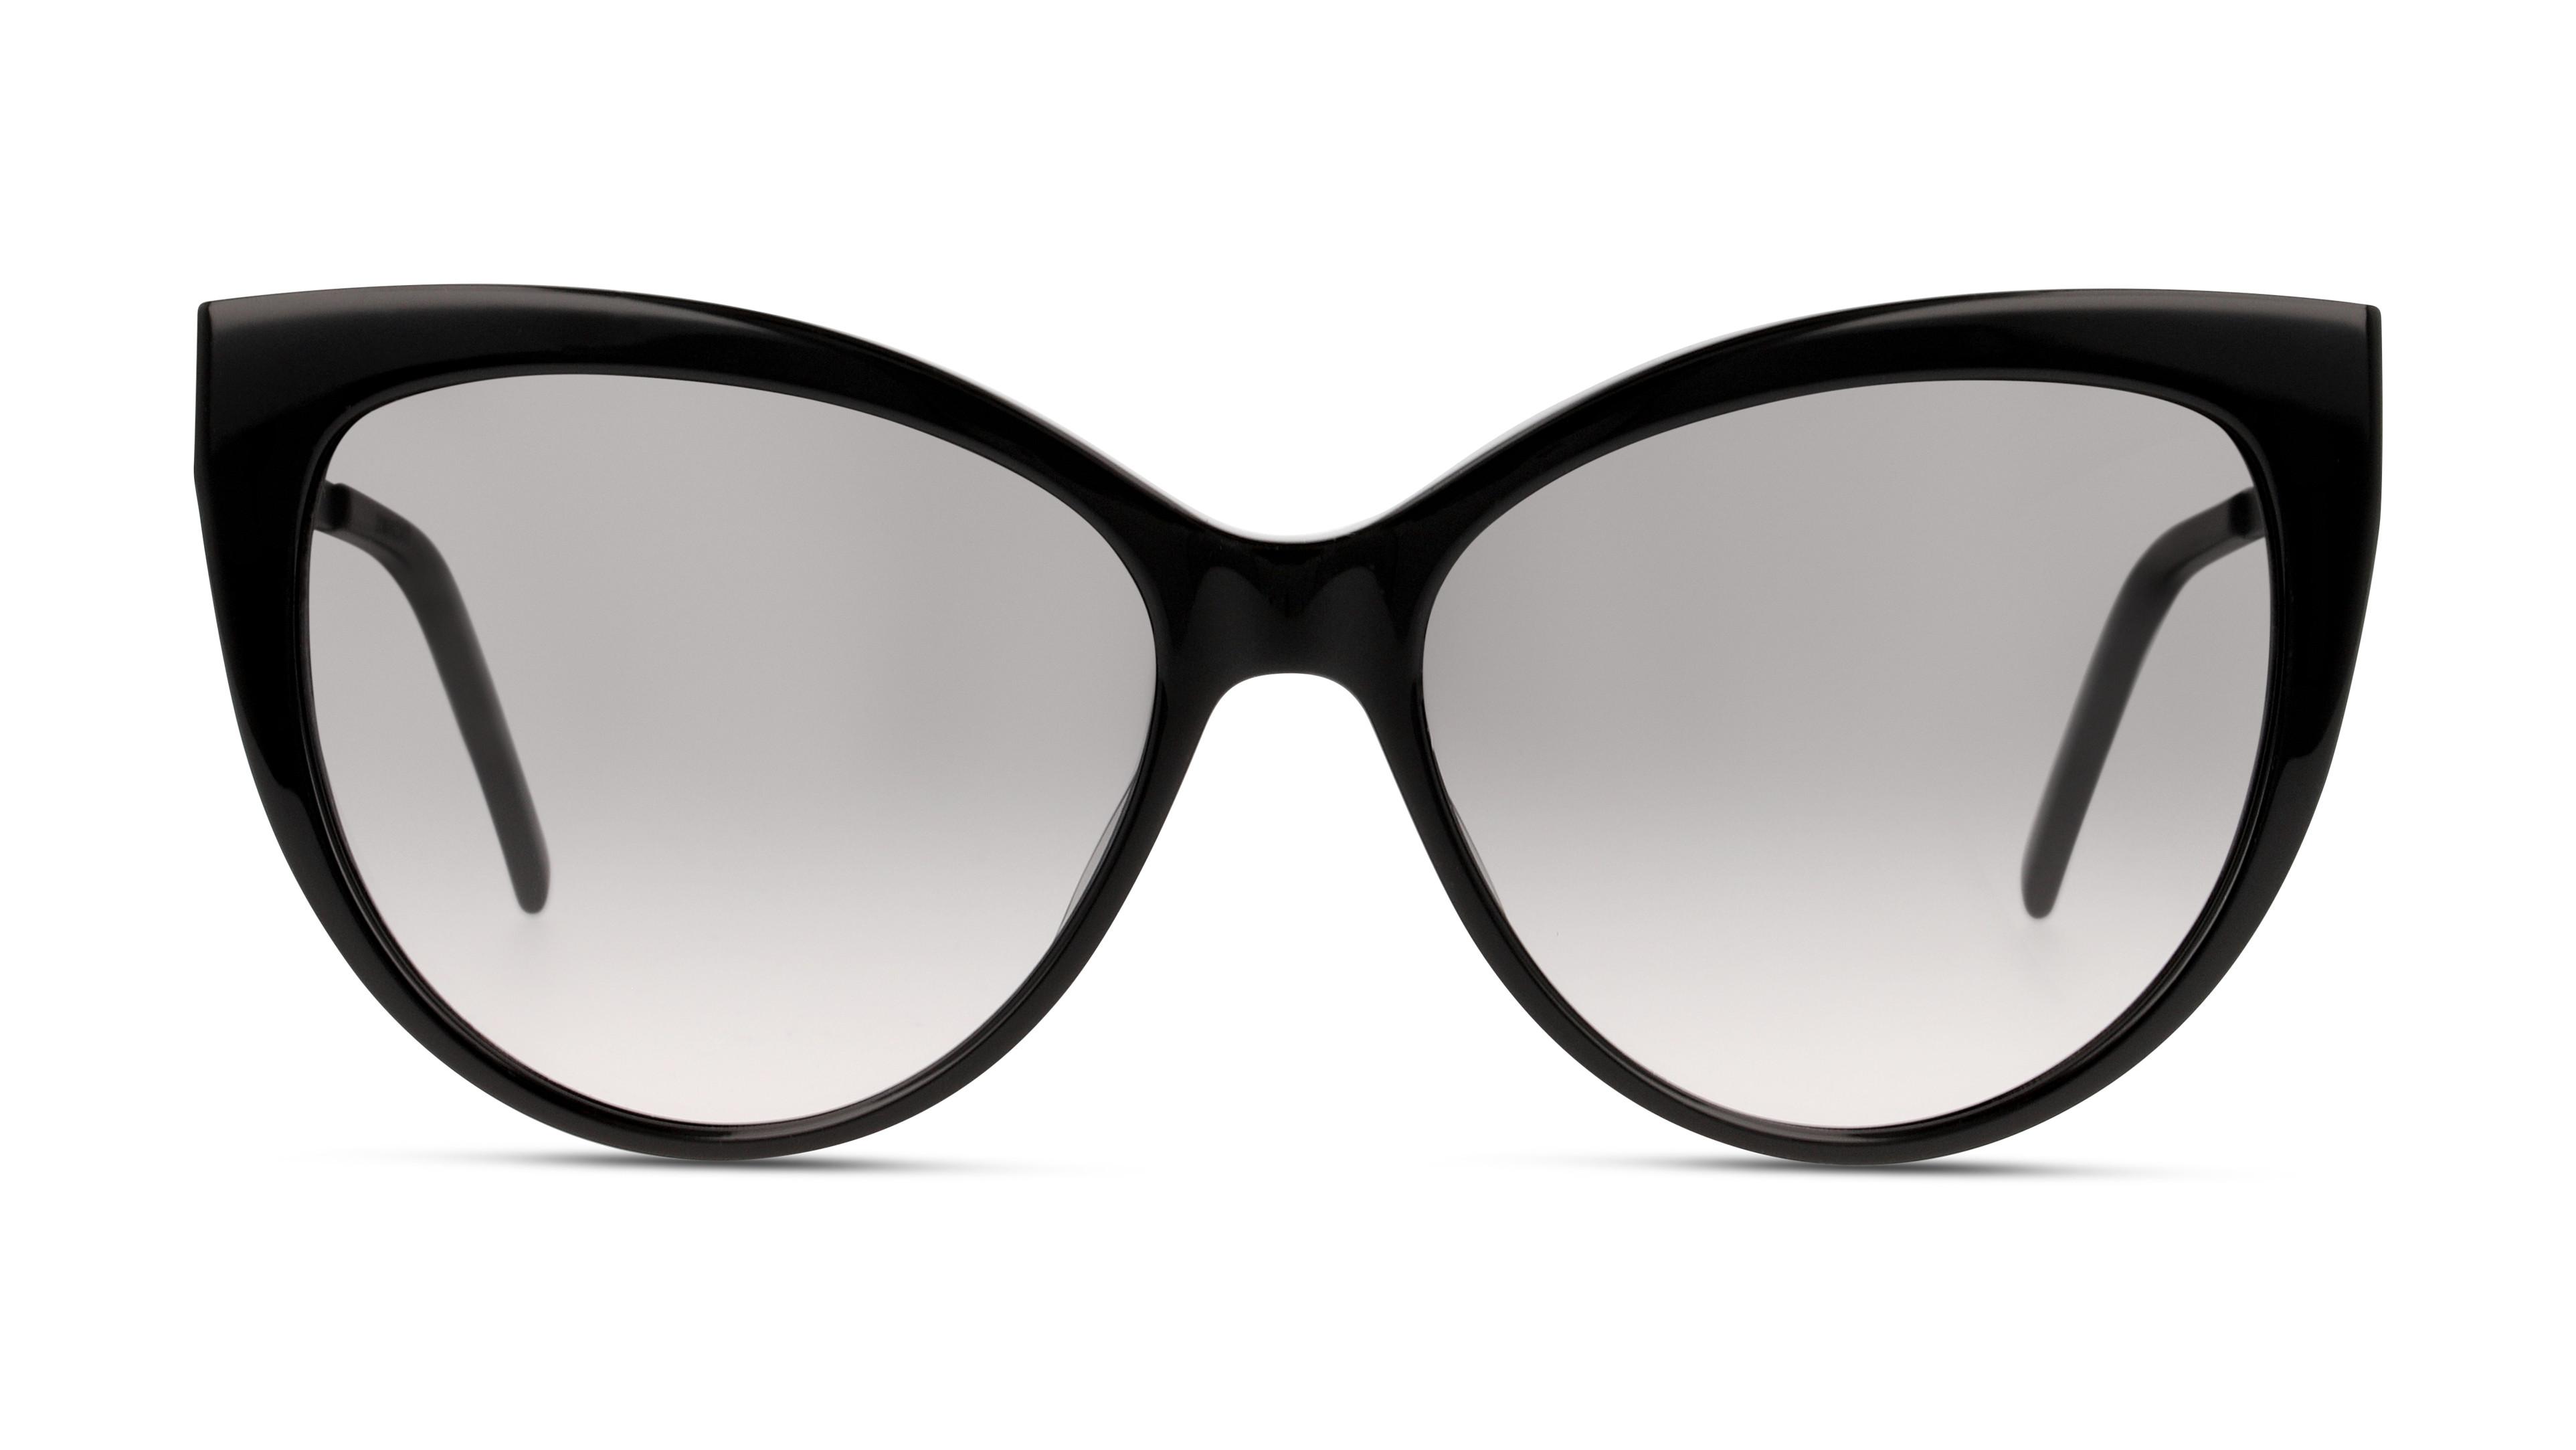 8056376273236-front-01-saint-laurent-sl_m48s_a-eyewear-black-black-smoke